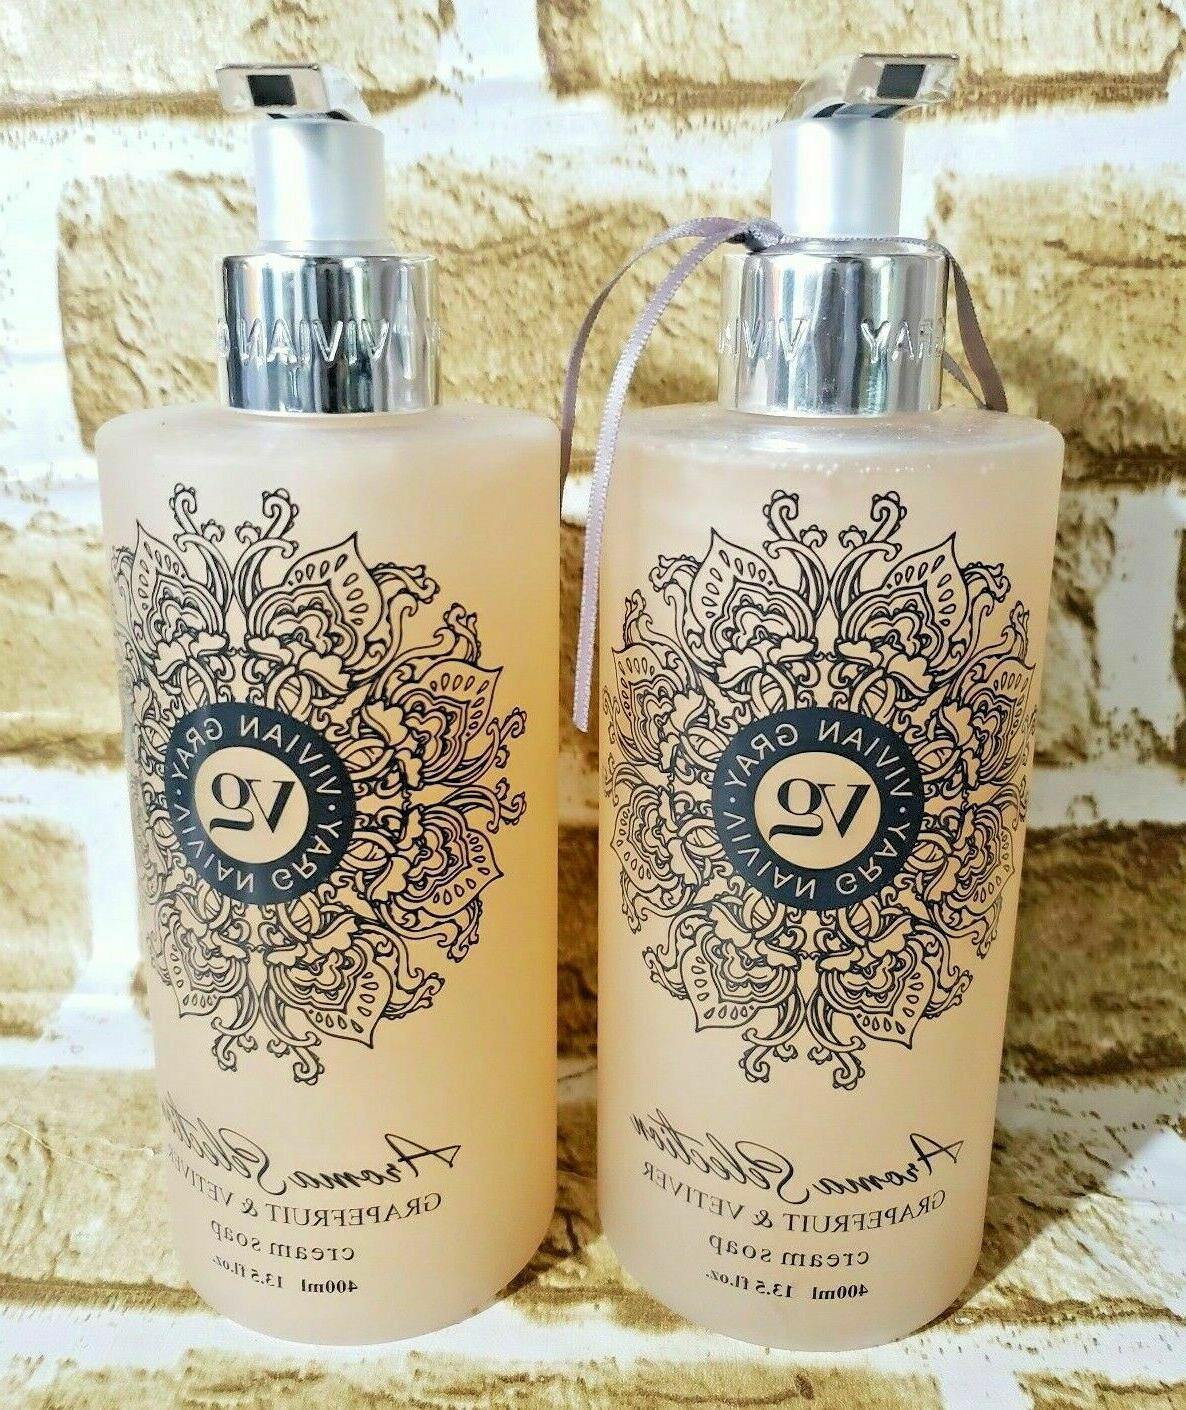 Lot of 2 Vivian Gray Grapefruit & Vetiver Cream Hand Soap 13